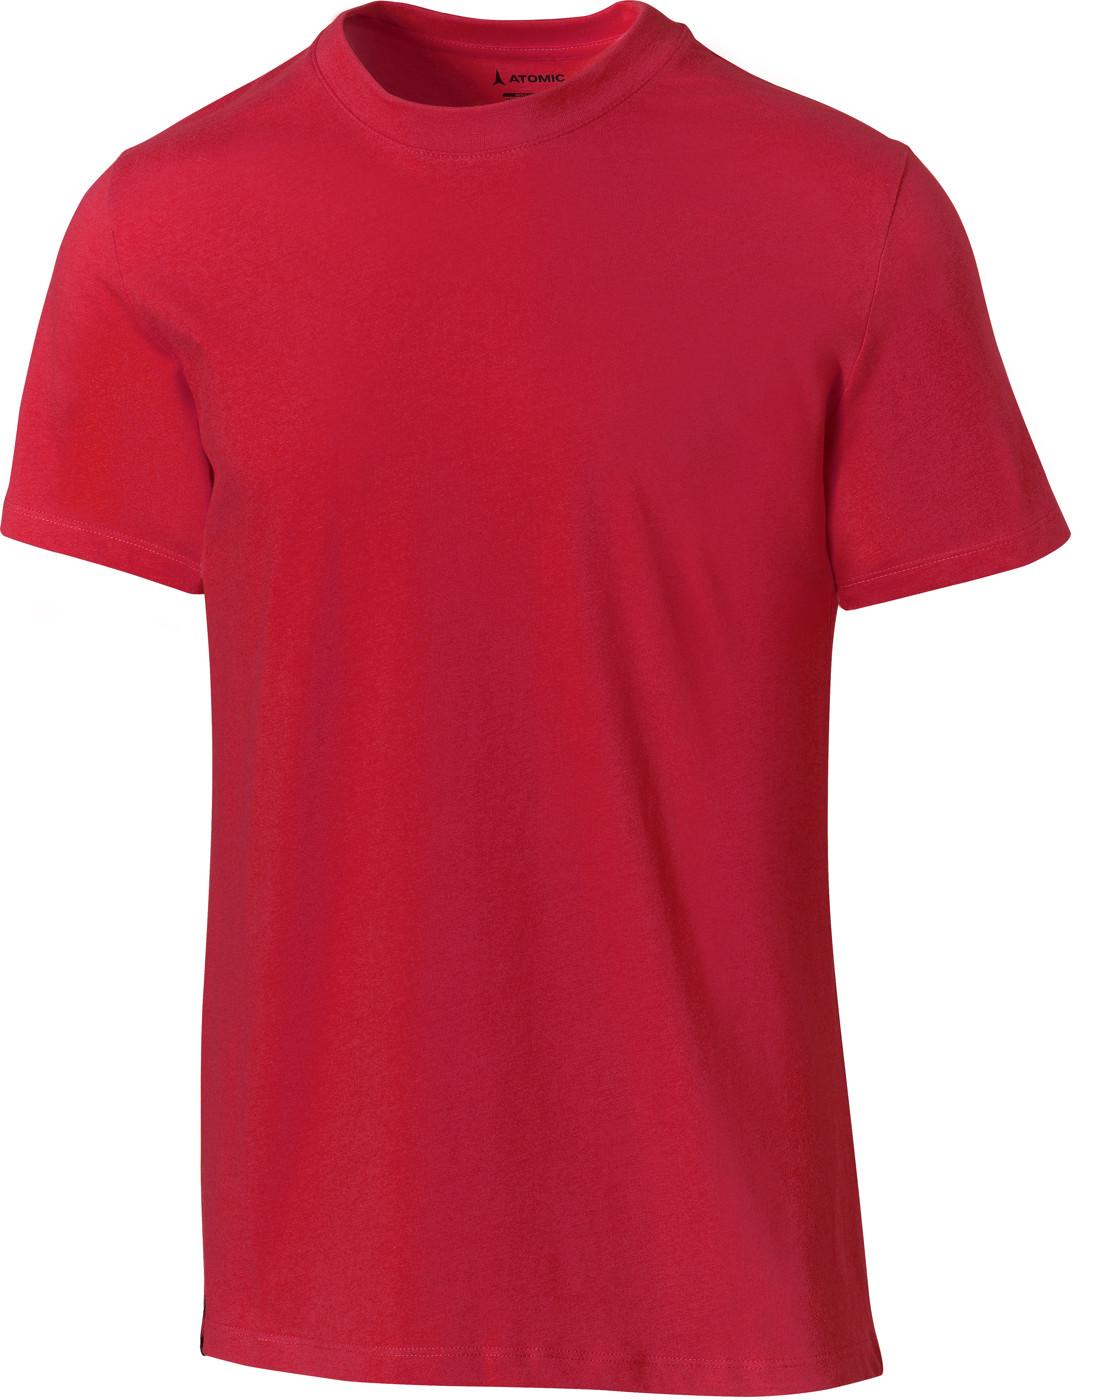 ATOMIC KEY INITIATIVE T-SHIRT Red S - Herren